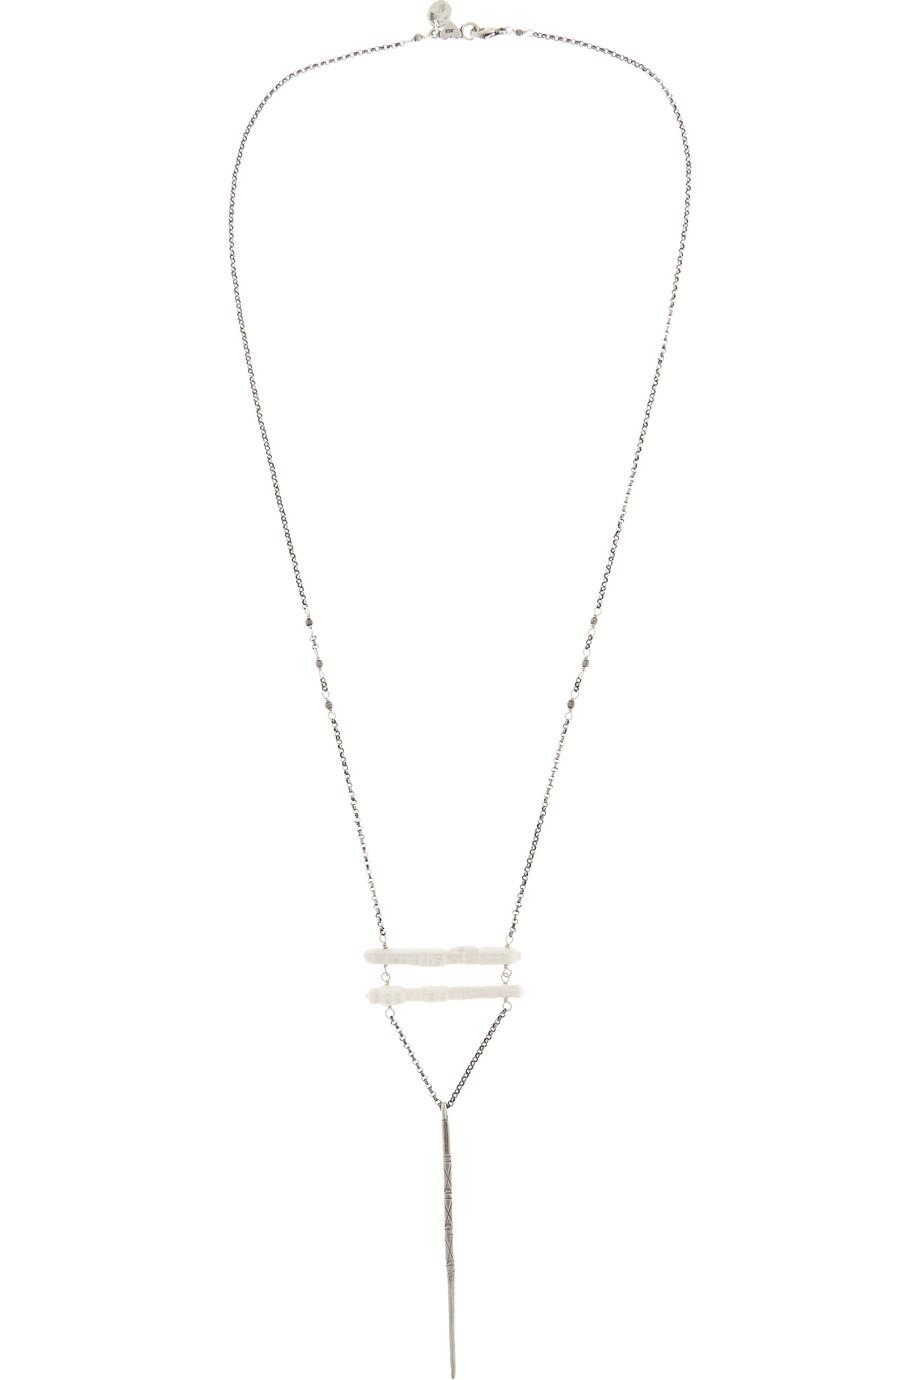 Chan Luu Silver Pearl Necklace, Women's